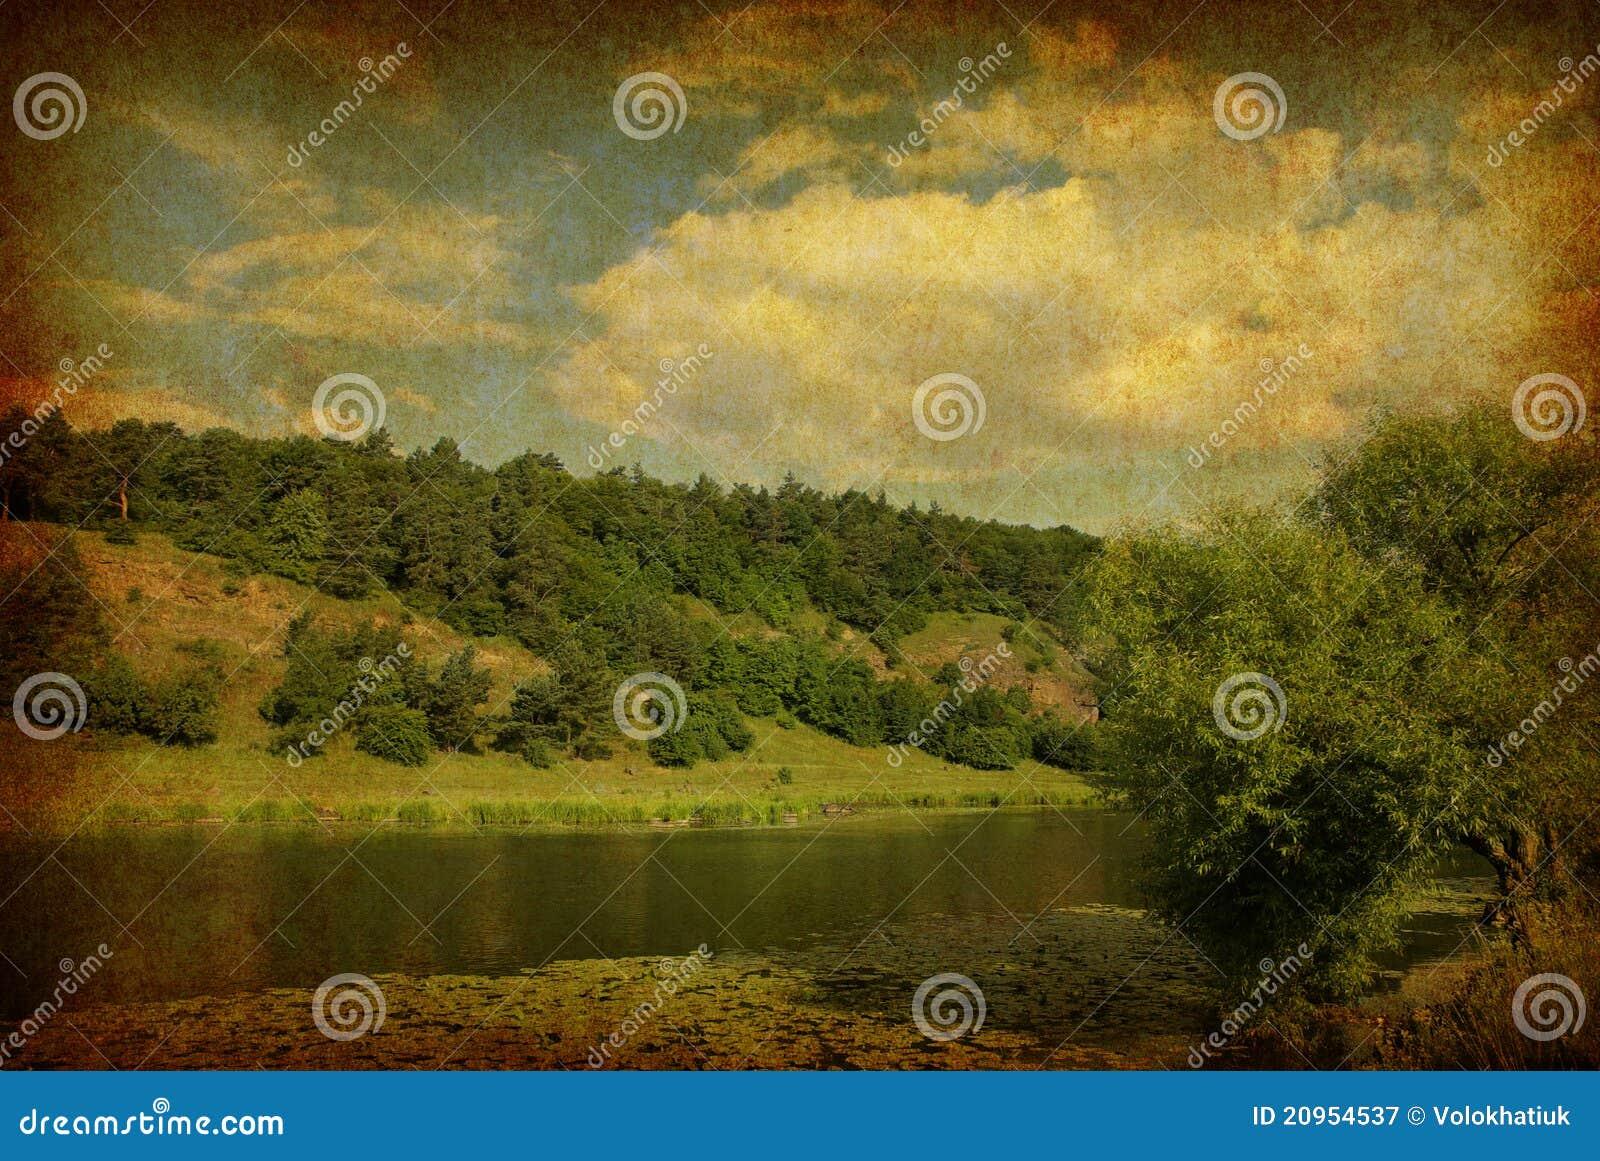 Vintage Landscape Photo Royalty Free Stock Photography ...